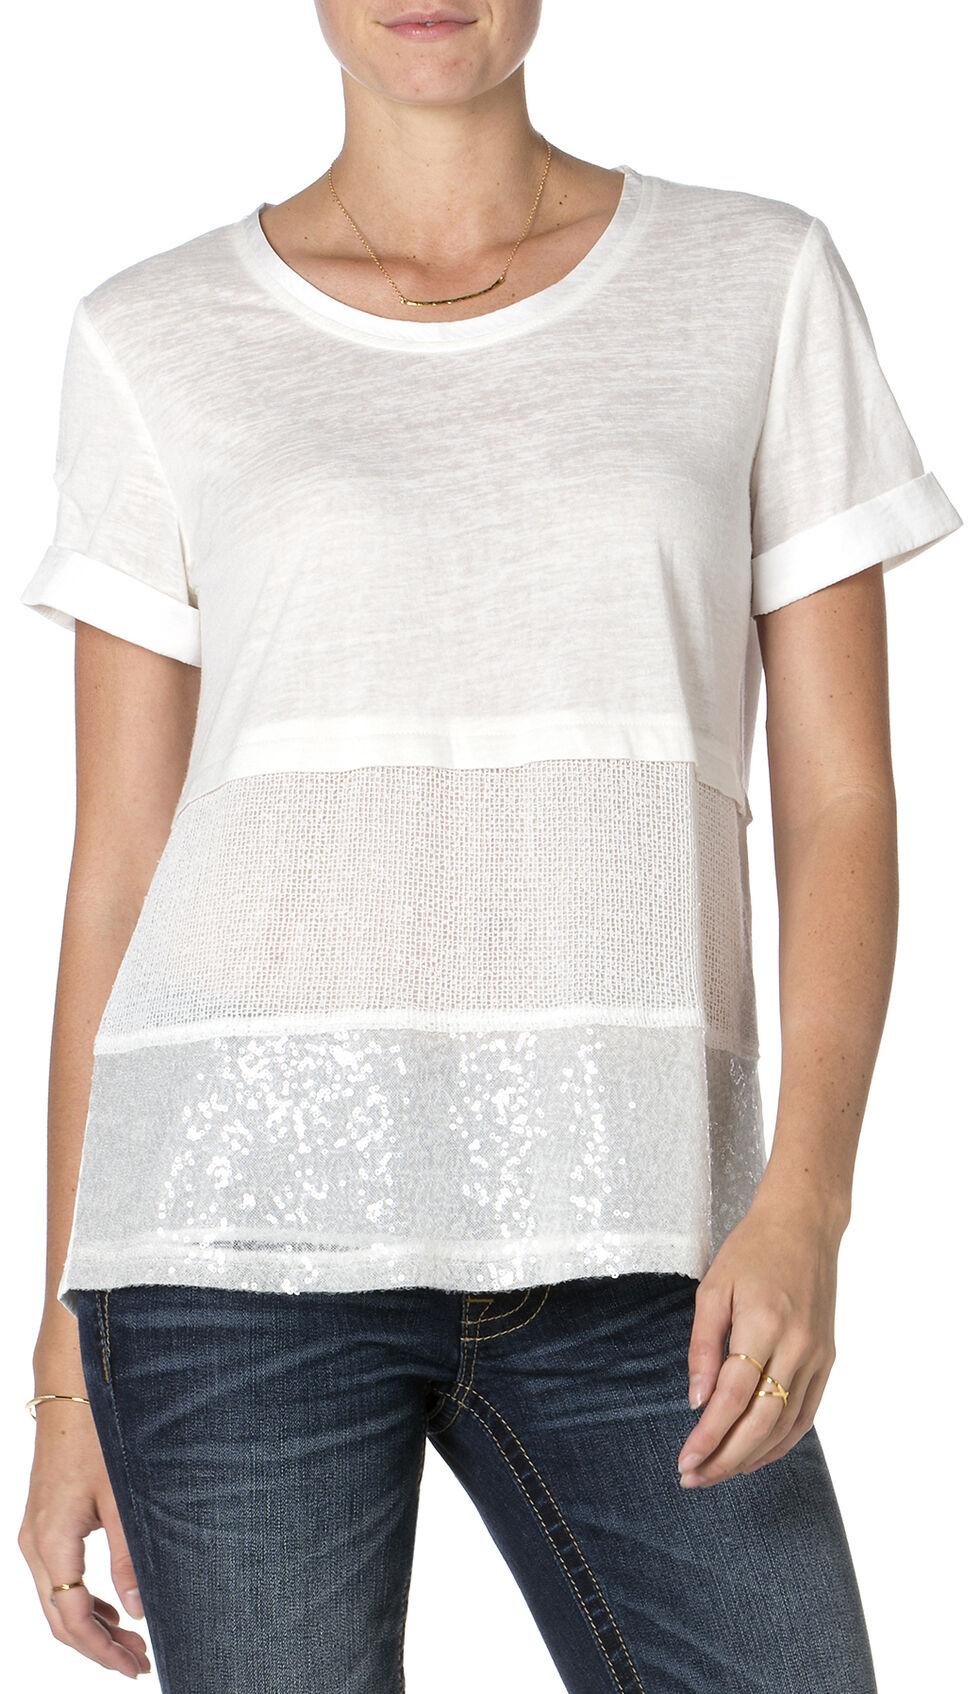 Miss Me Mix-Match Short Sleeve T-Shirt, Off White, hi-res